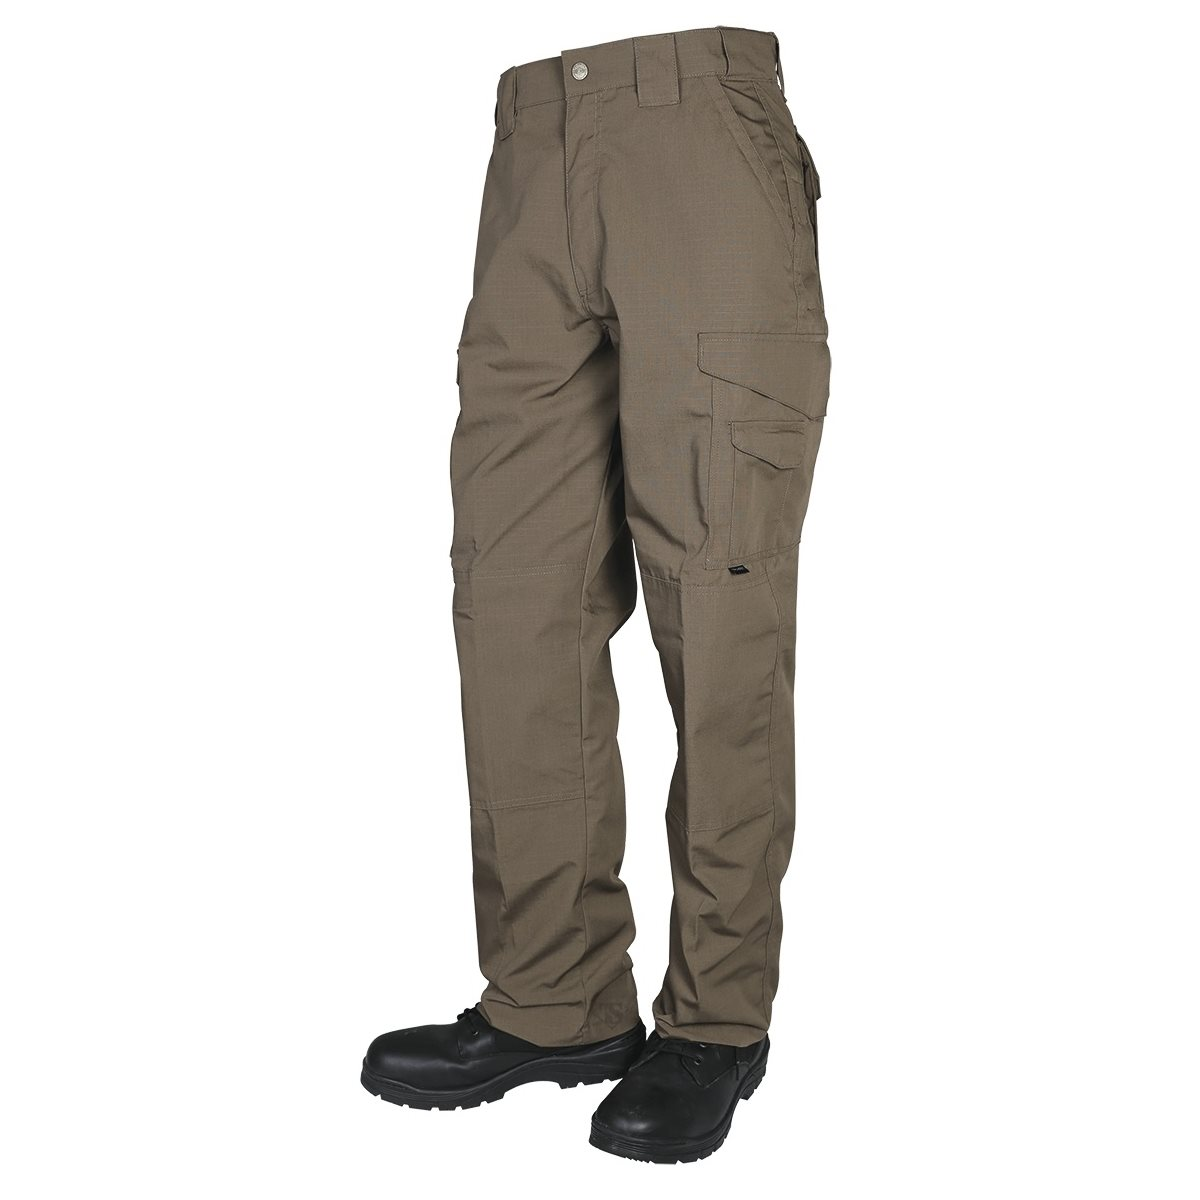 Kalhoty 24-7 TACTICAL Teflon rip-stop EARTH